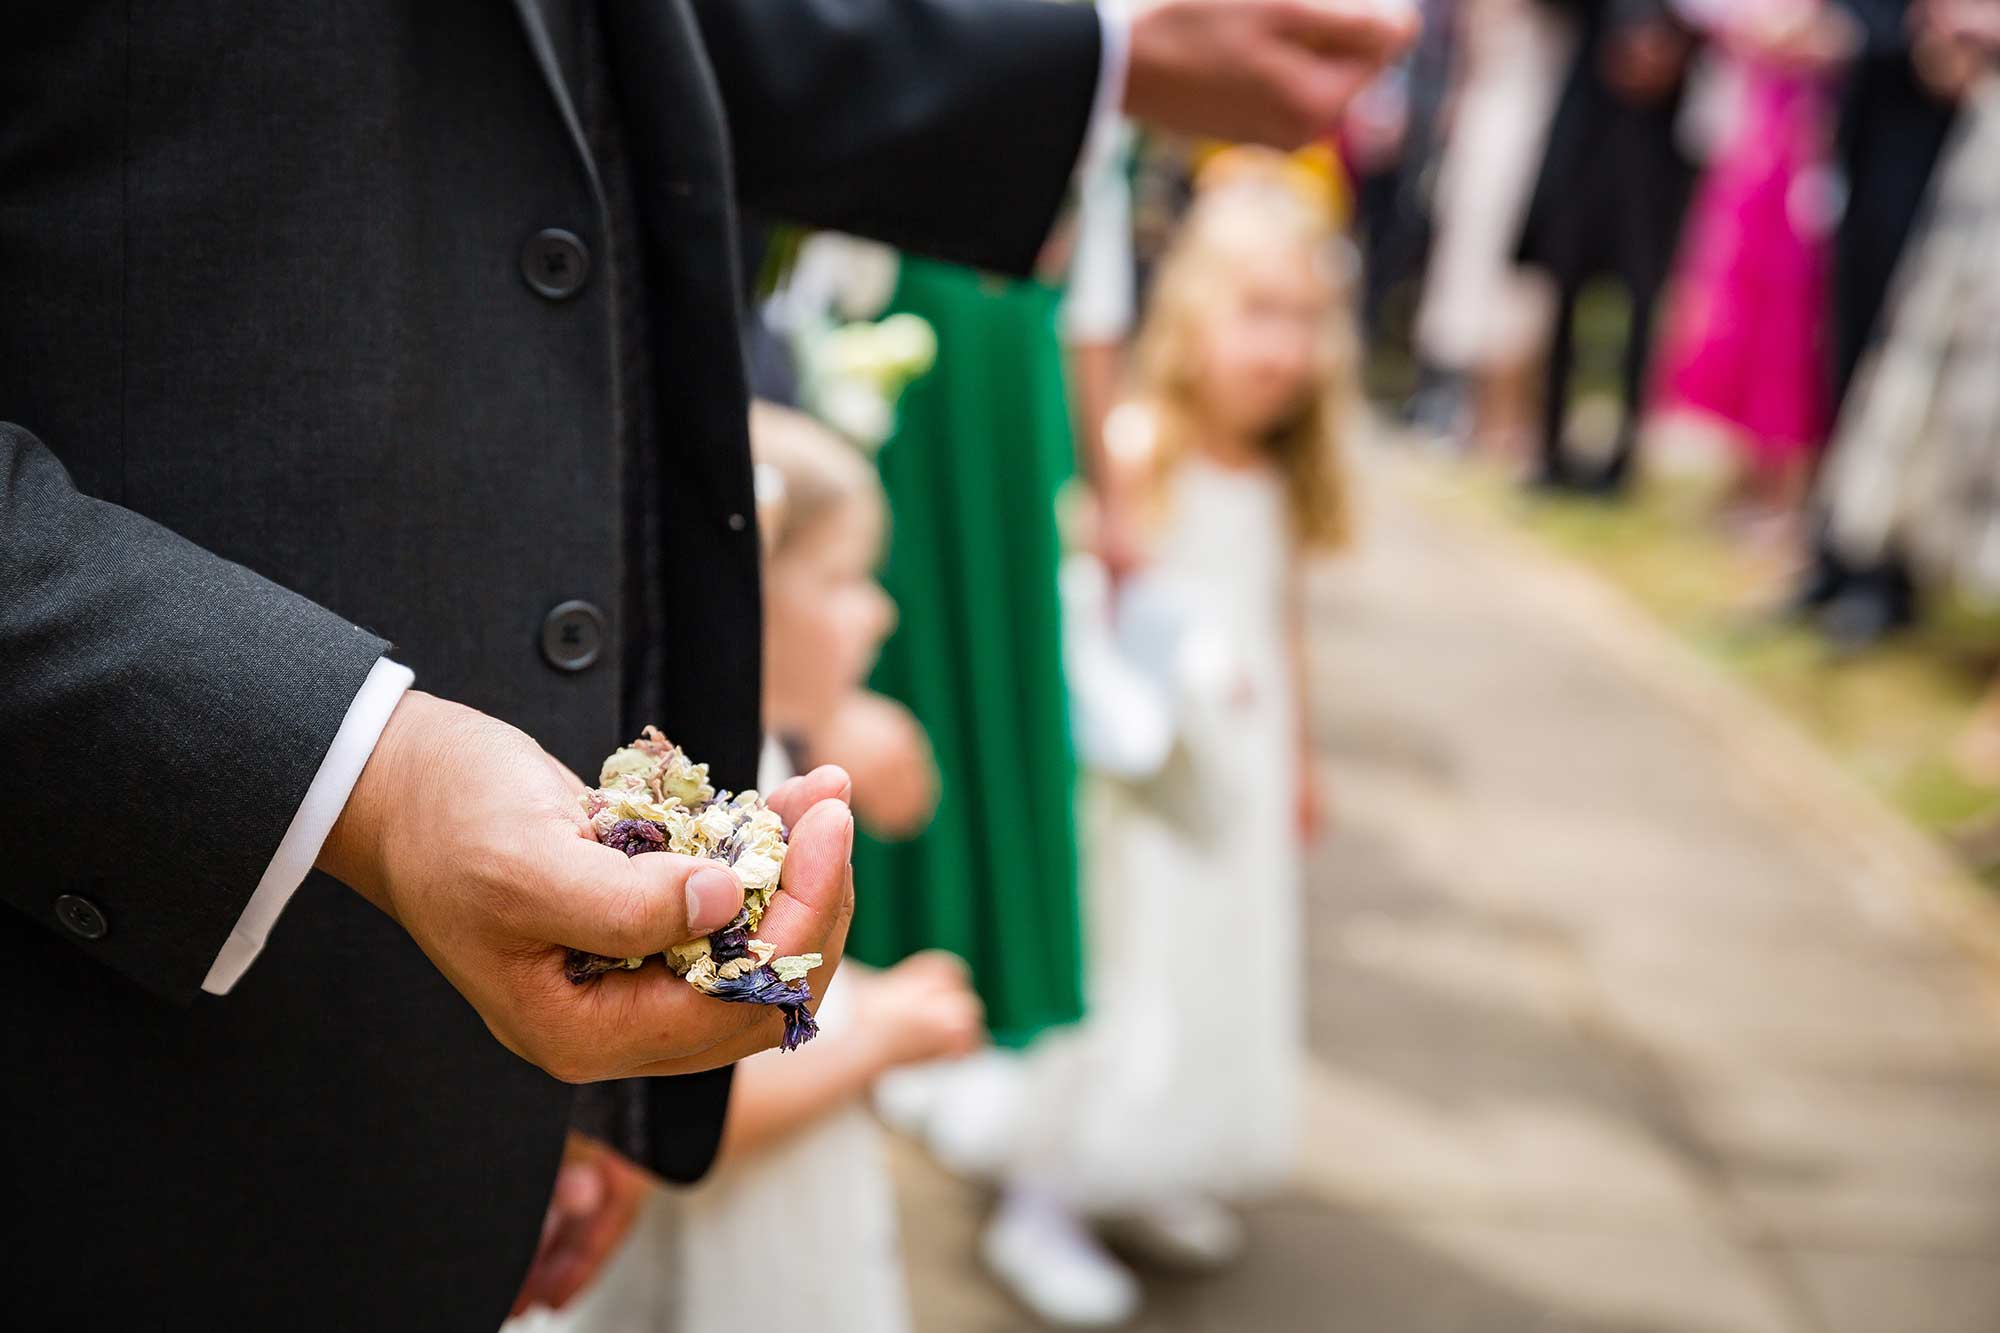 a hand holding confetti